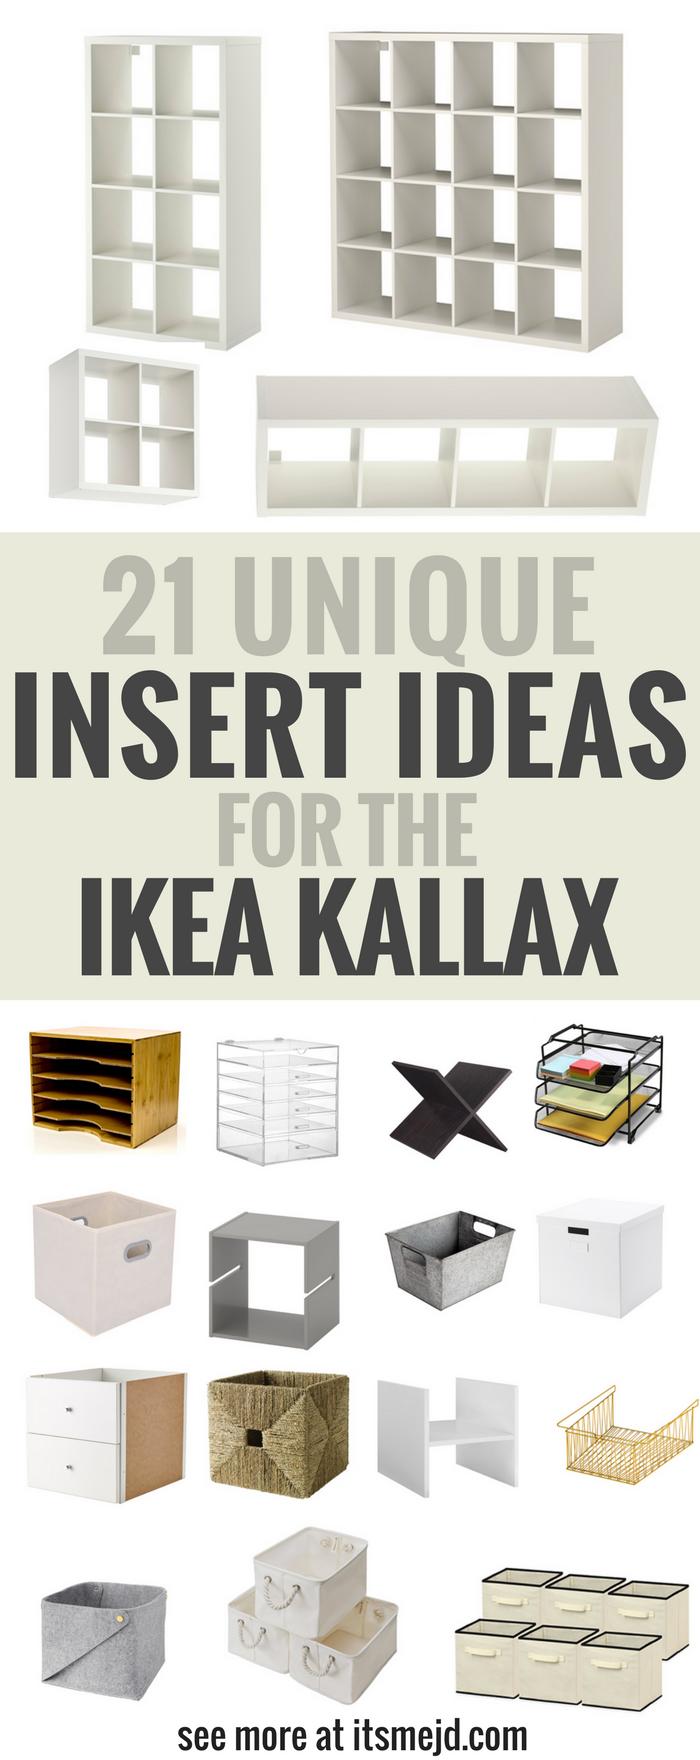 21 Unique Insert Ideas for an Ikea Kallax Bookcase | Pinterest ...